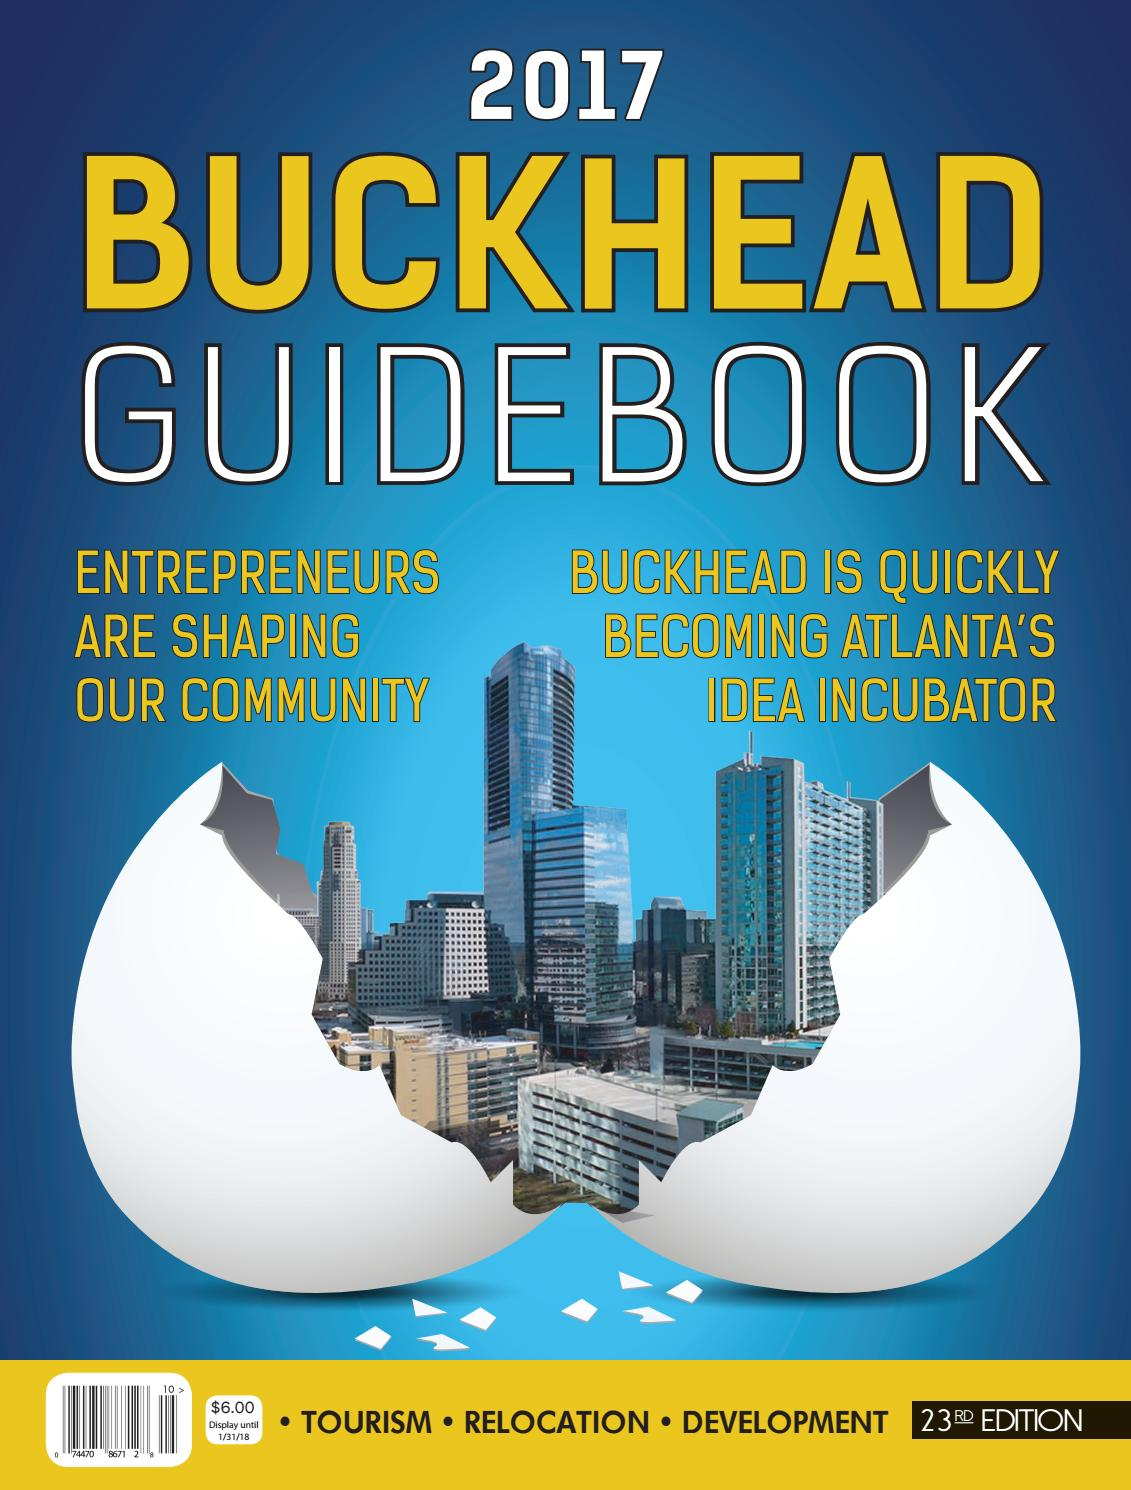 2017 Buckhead Guidebook by PubMan, Inc  - issuu